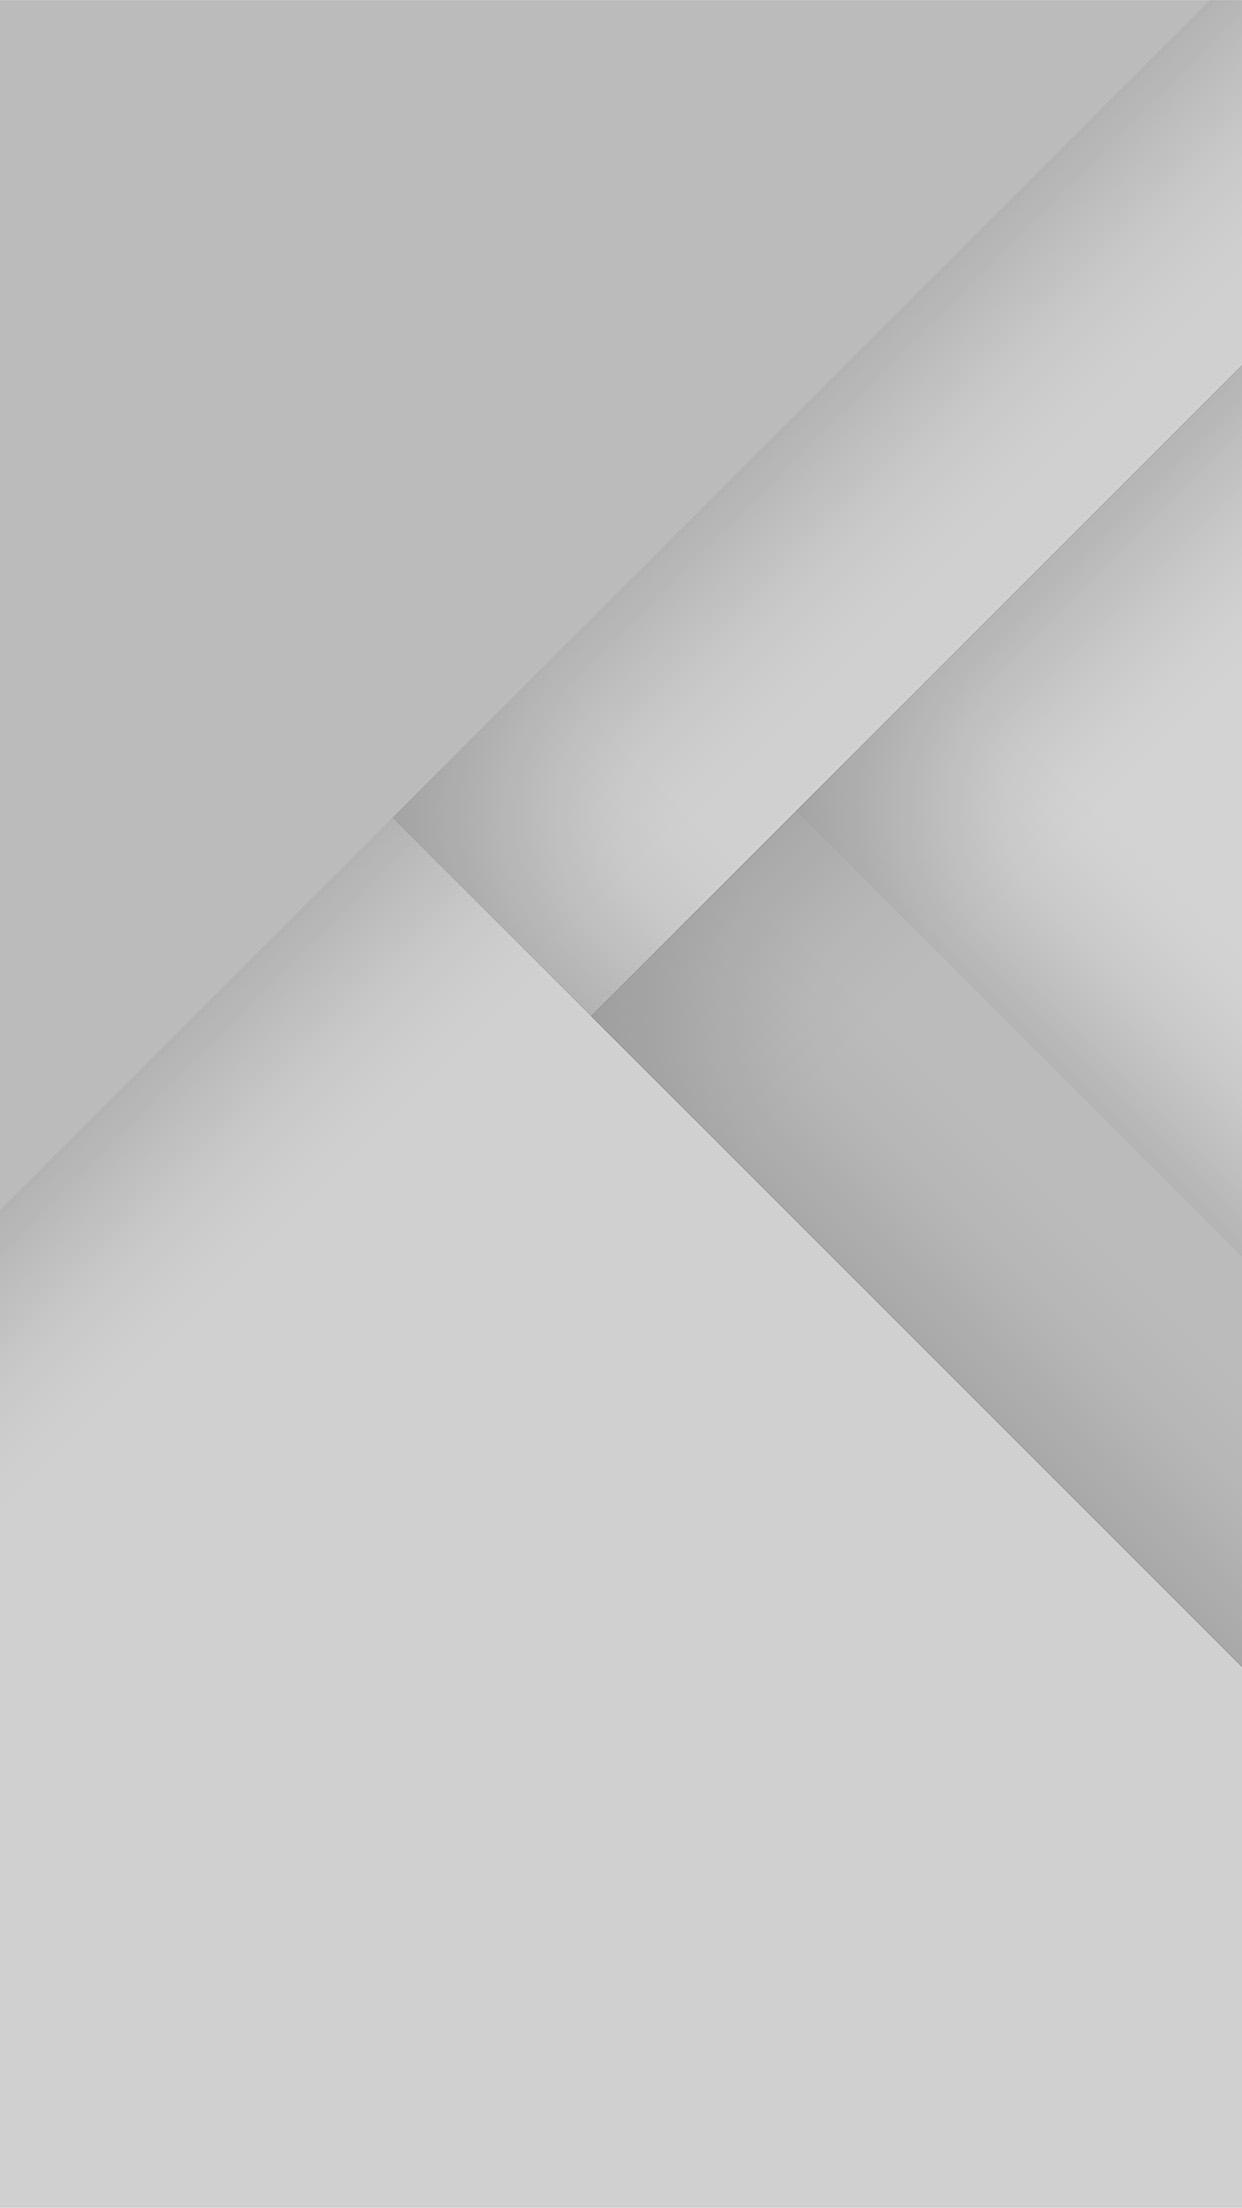 Vk56 Android Lollipop Material Design White Pattern Wallpaper